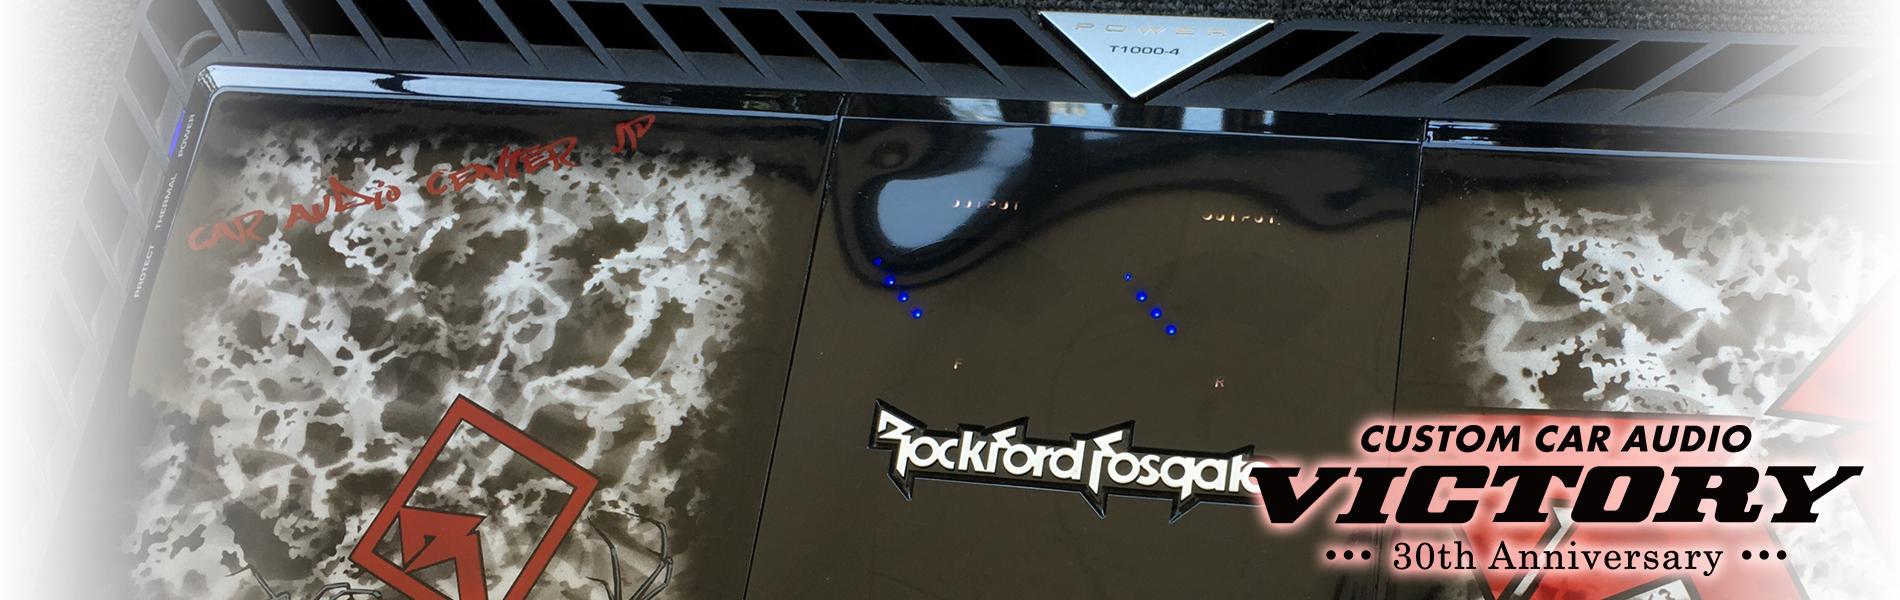 rockfordfosgate T1000-4